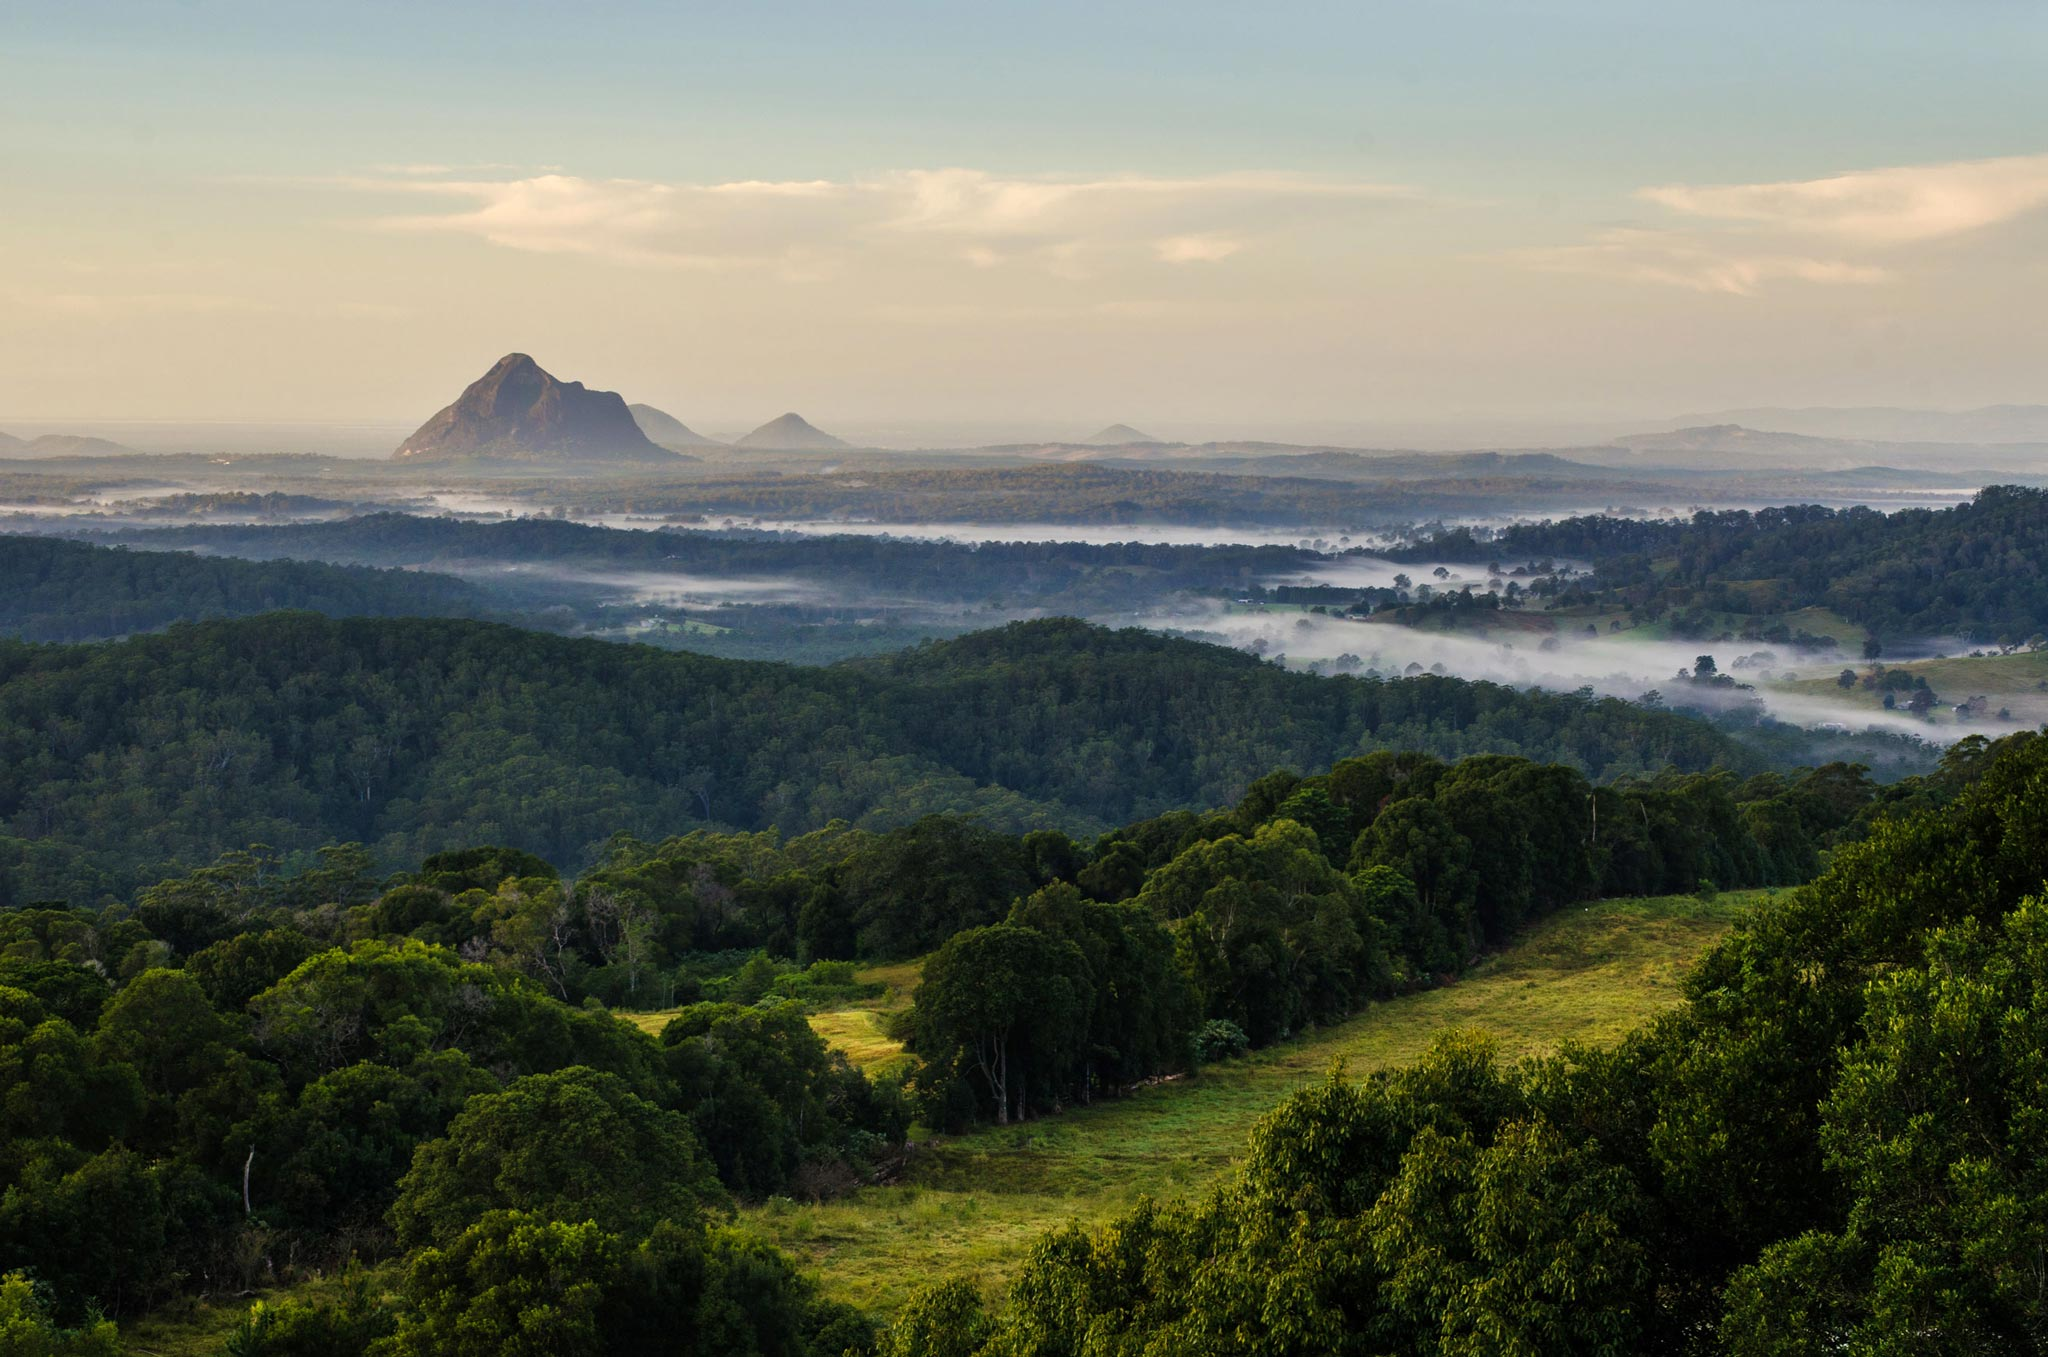 Paesaggi-Australia - DSC 8918 - Glass-house-mountains-Australia - Glass-house-mountains-Australia